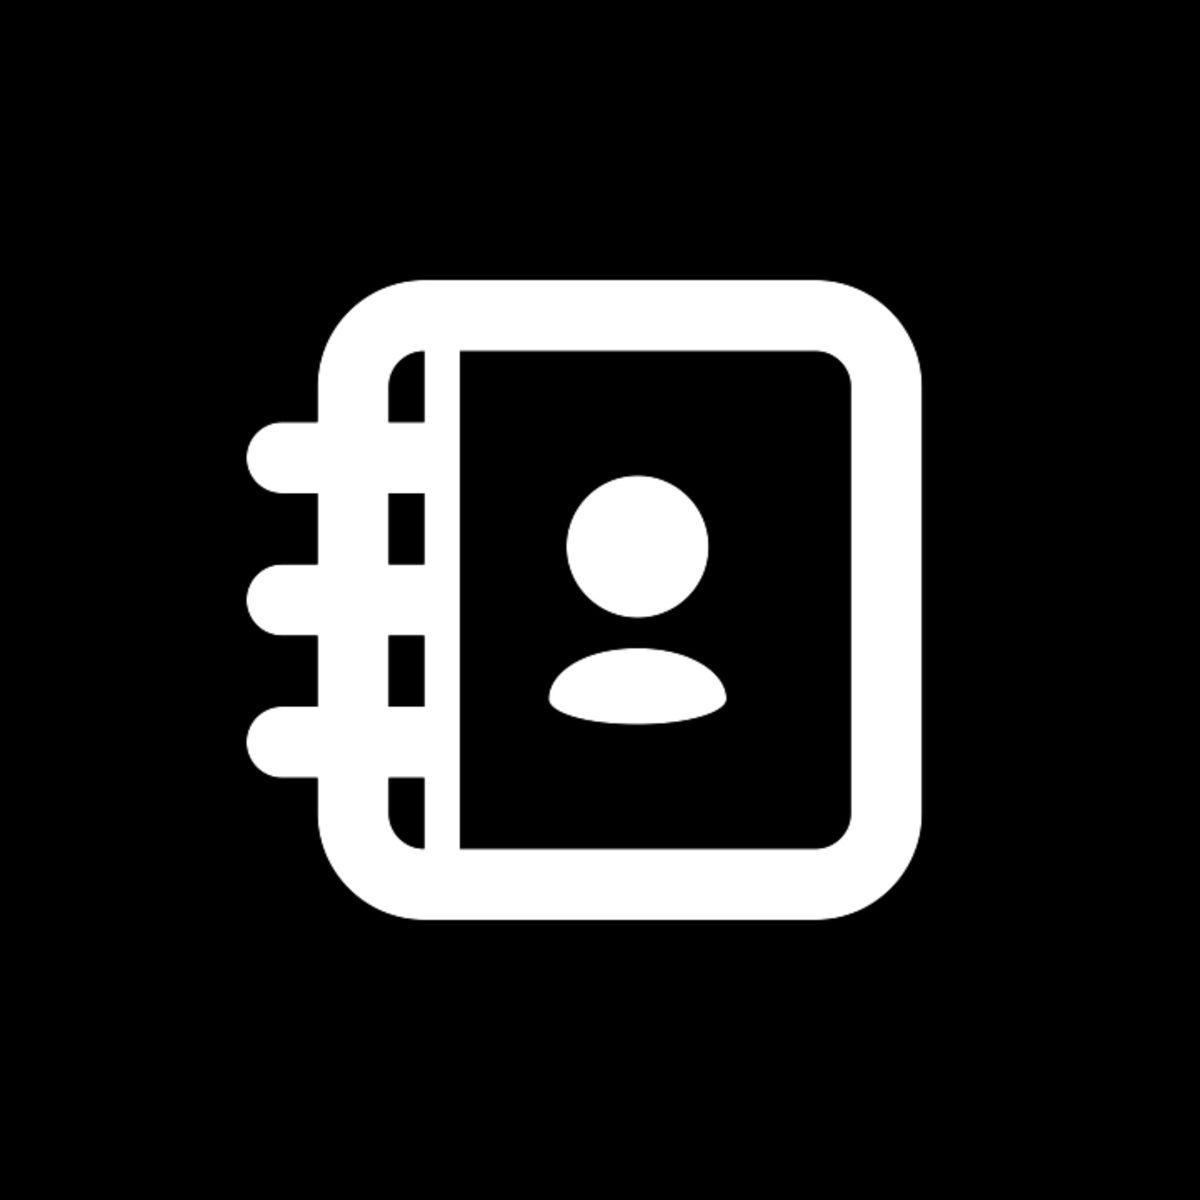 Black Contacts Icon Black App Iphone Photo App App Logo